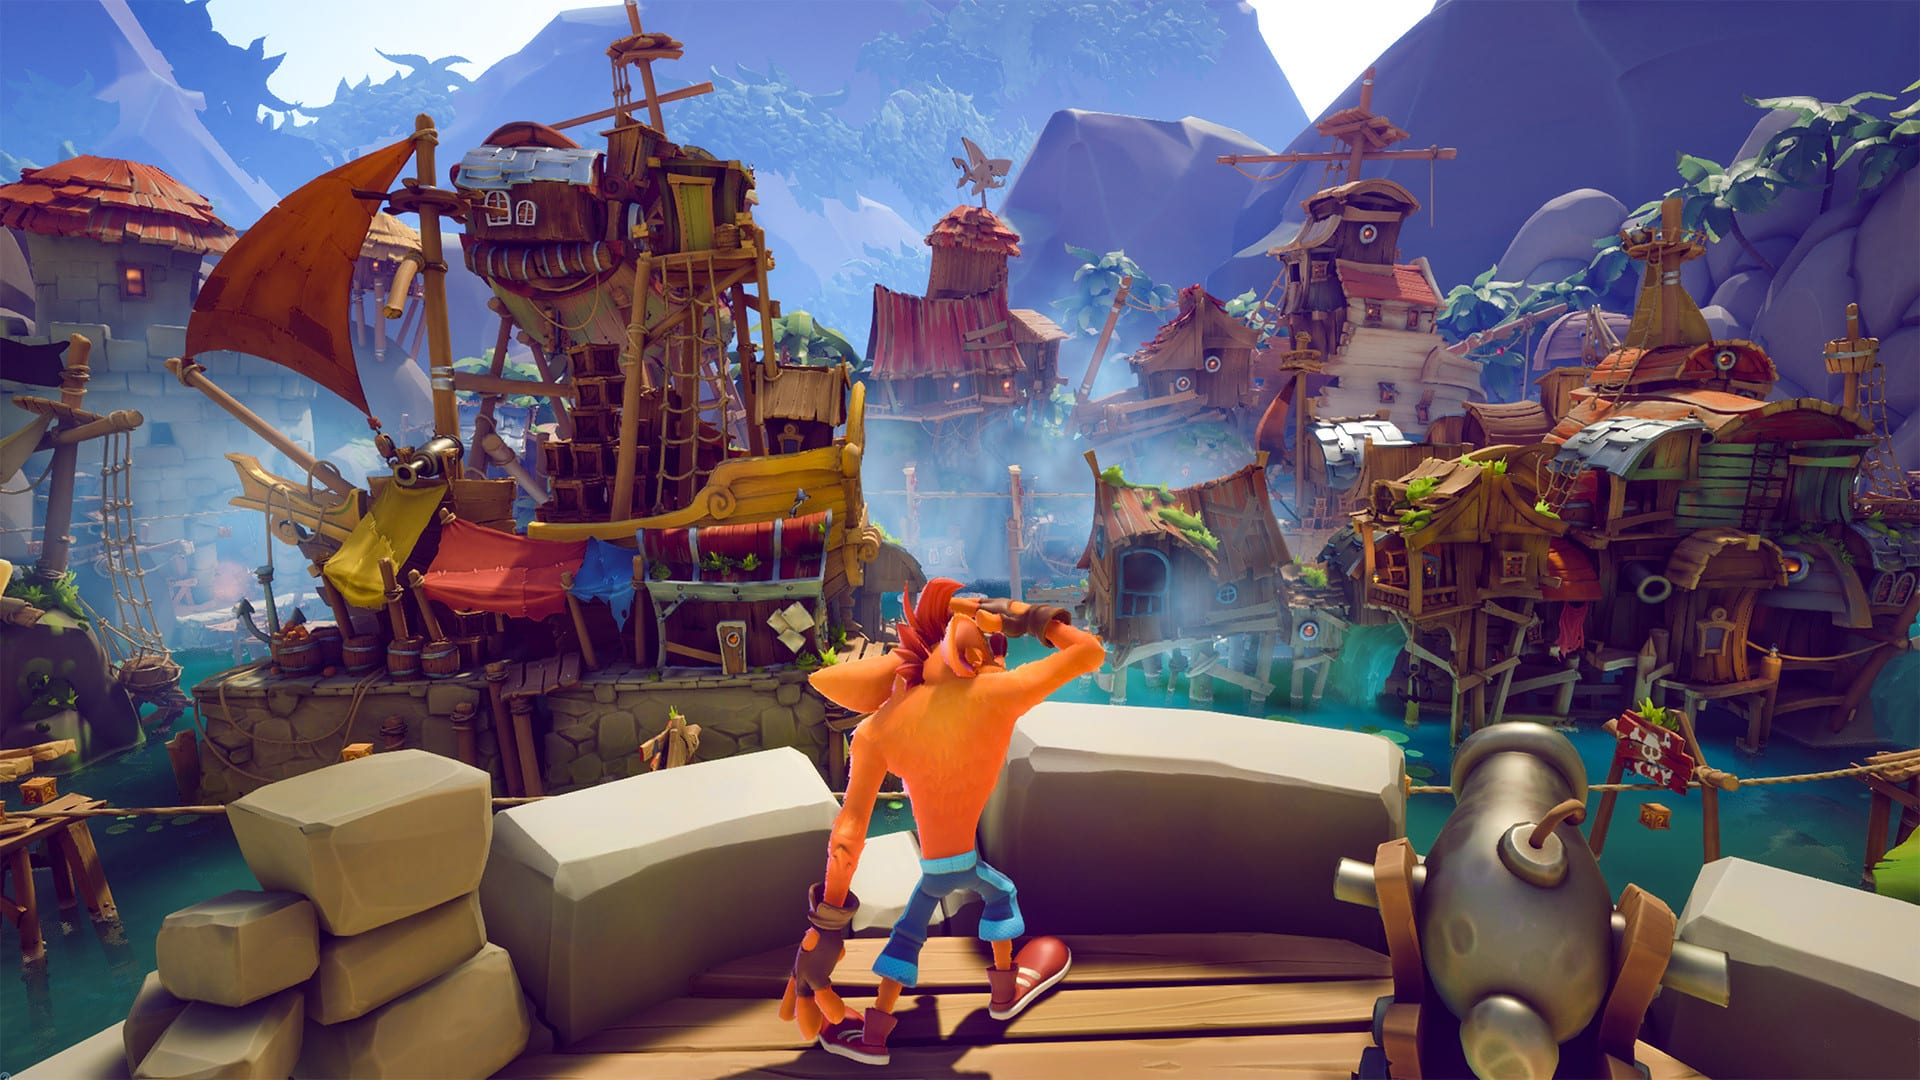 Crash Bandicoot 4 - It's About Time mikrotransakcie